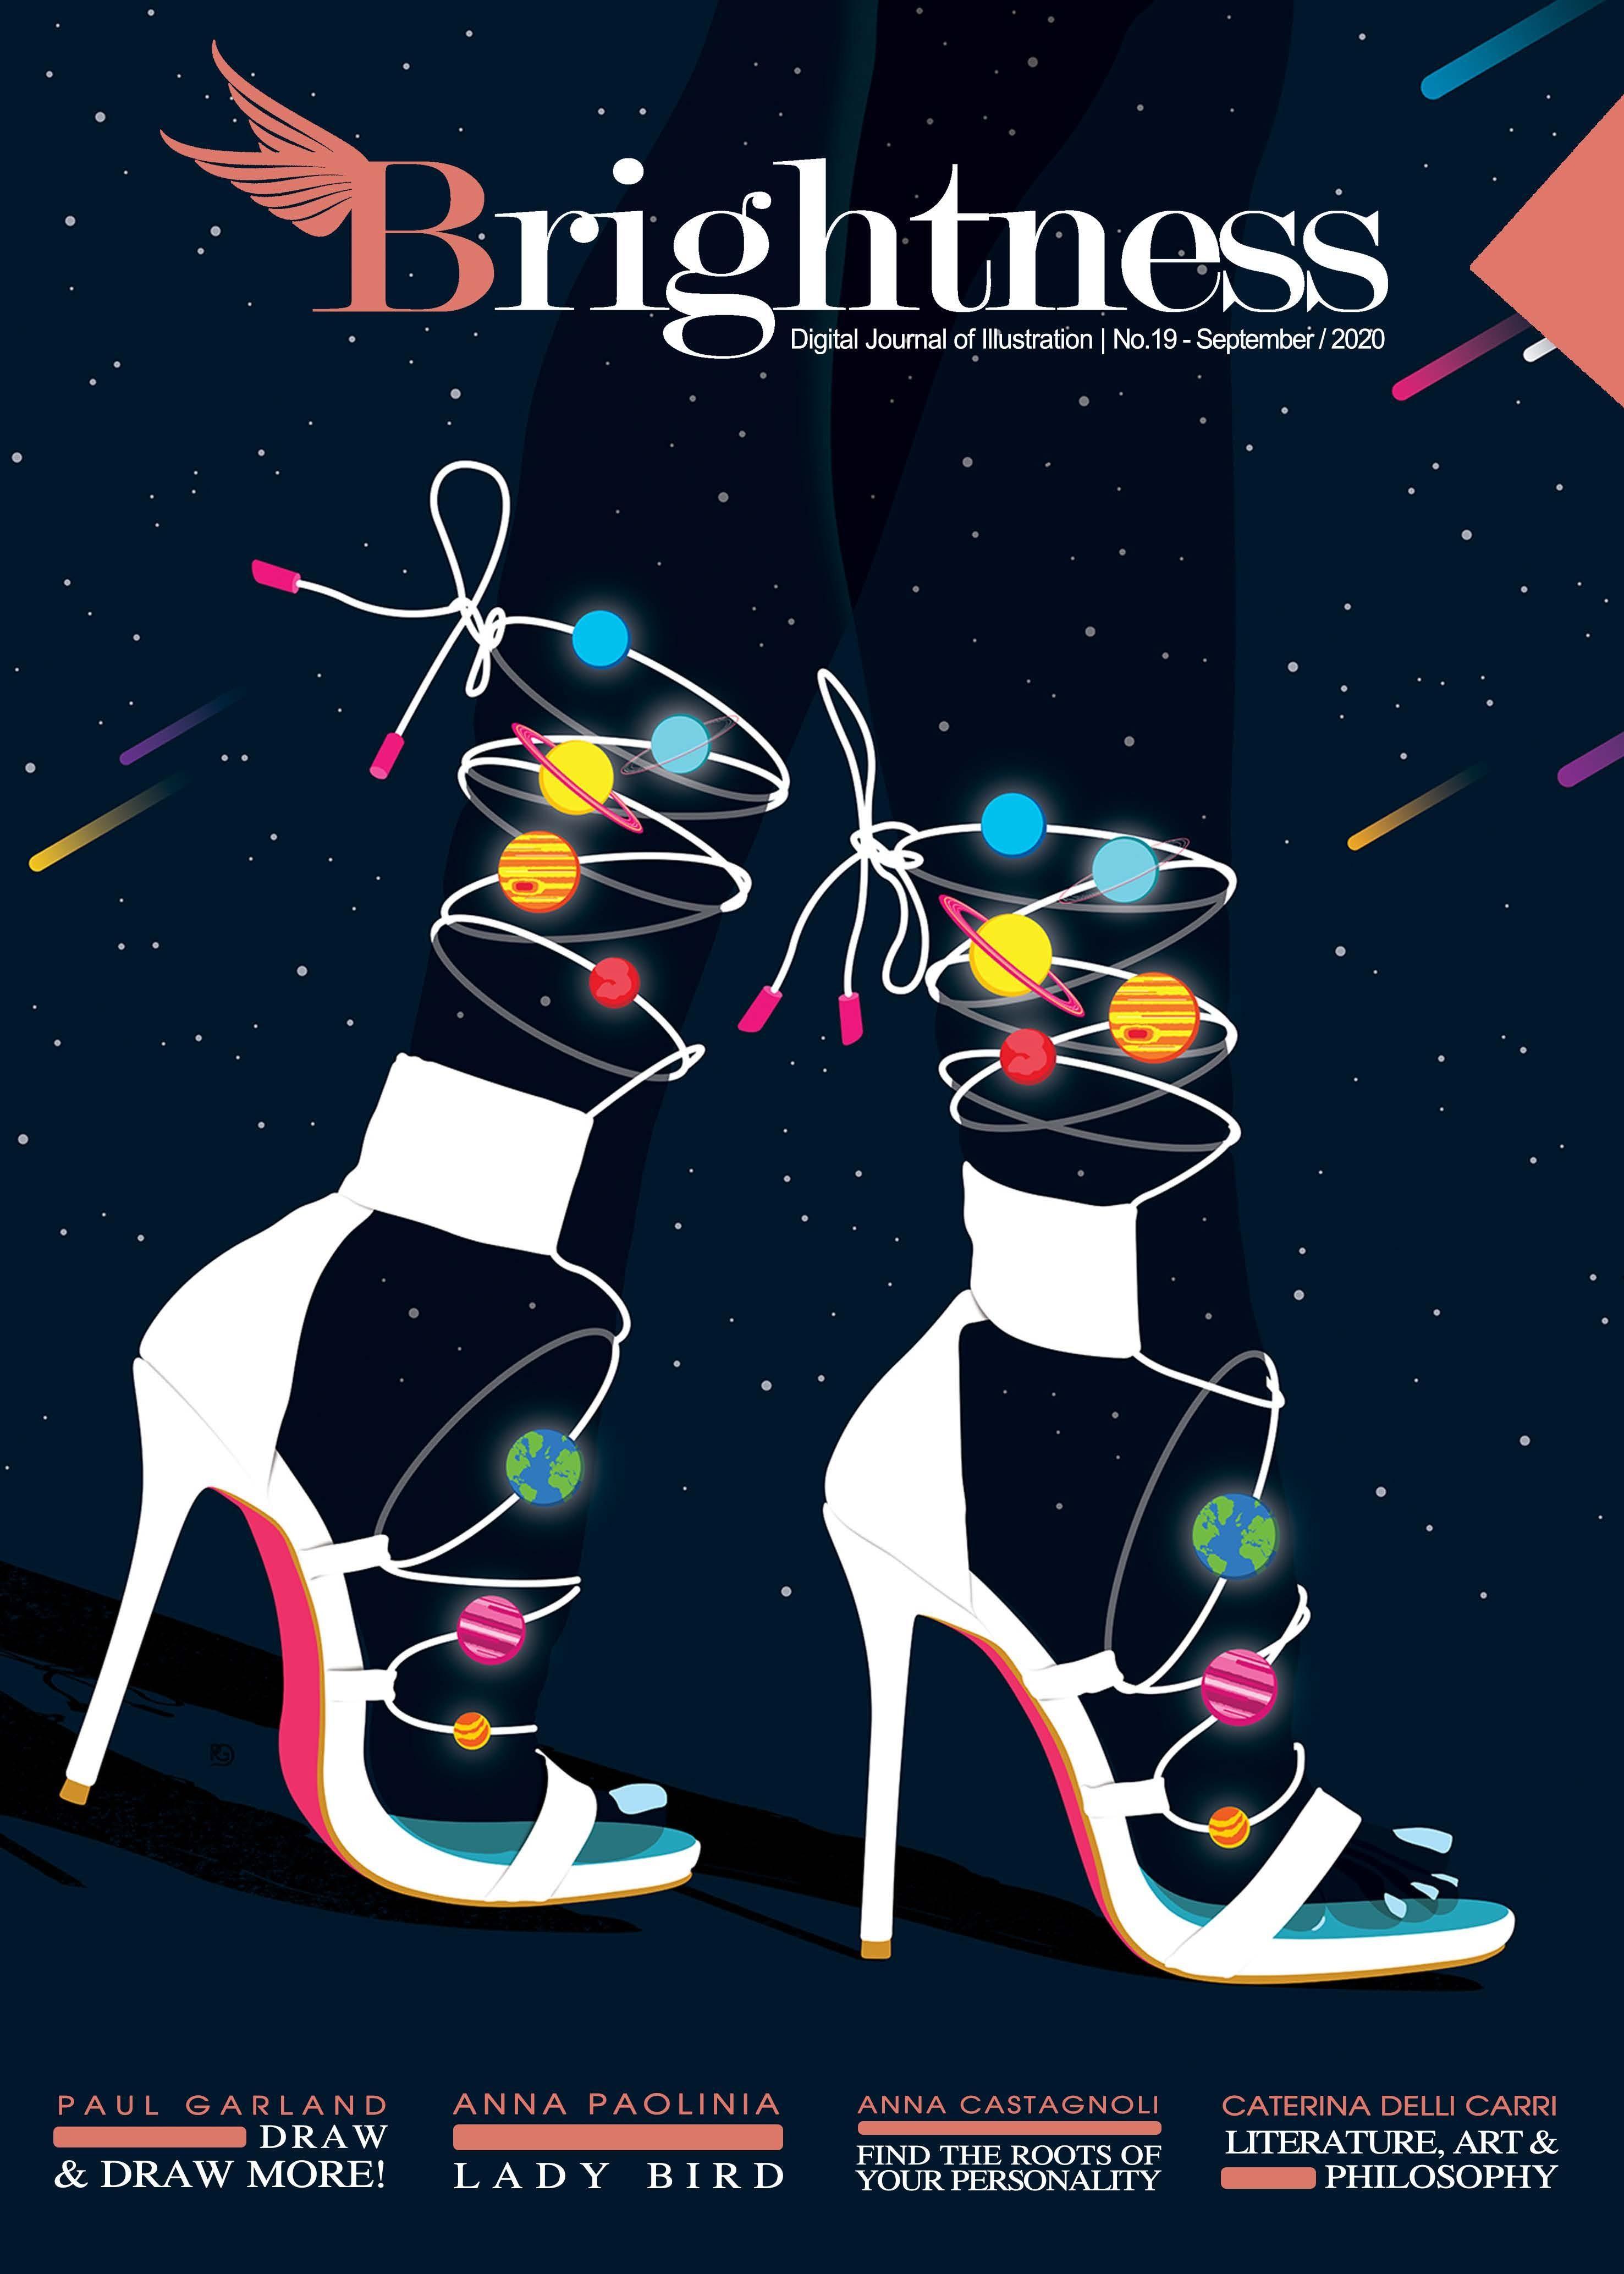 Page 1 of Brightness Magazine No 19 Published! Digital Journal of Illustration